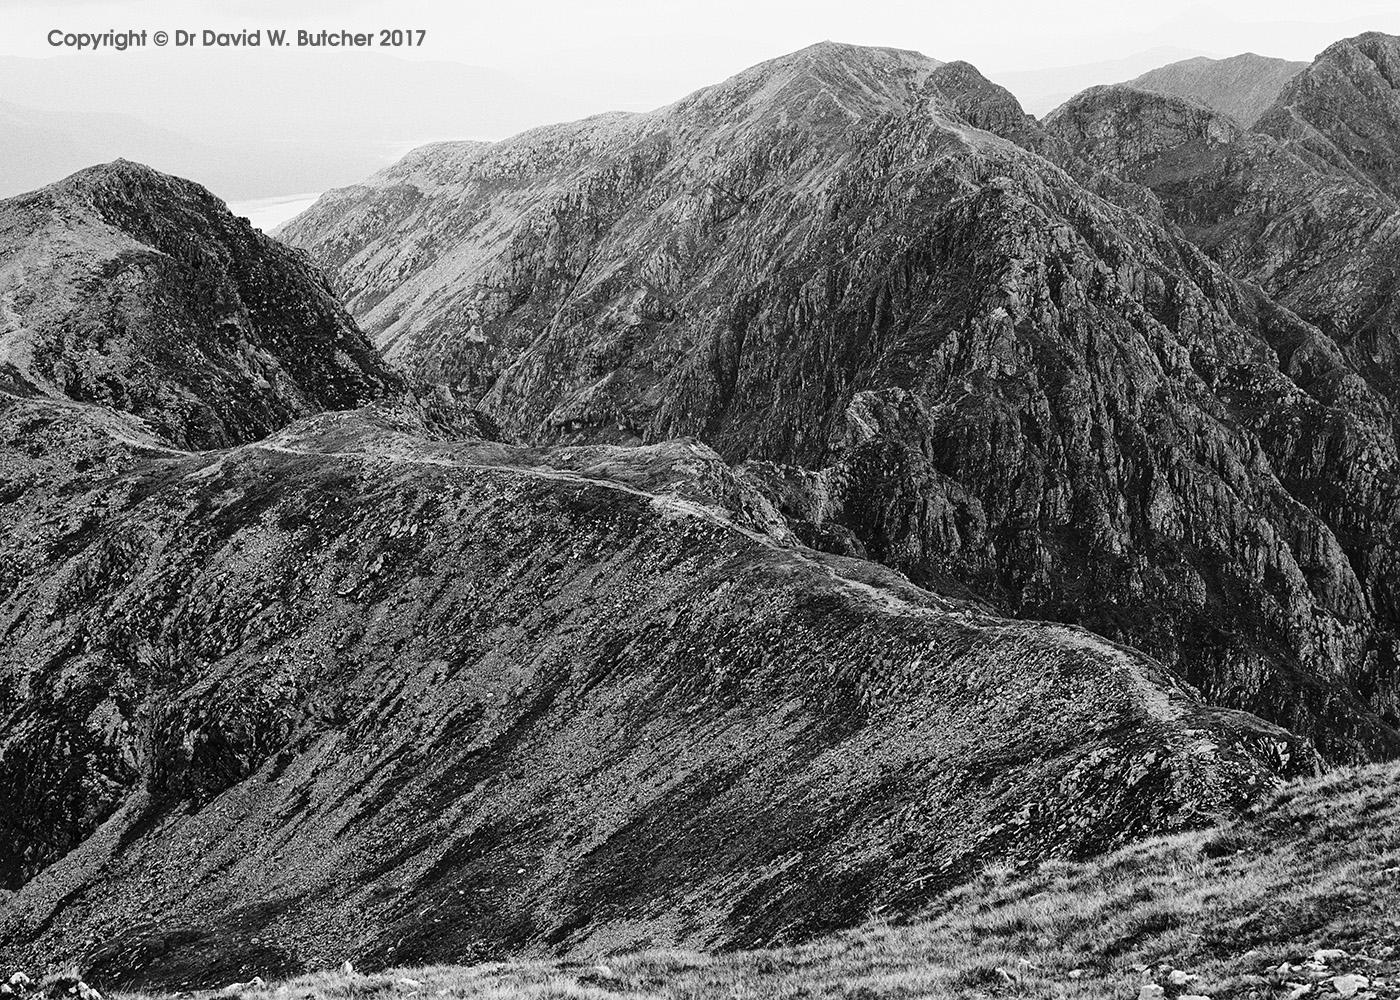 Aonach Eagach Ridge, Glen Coe, Scotland